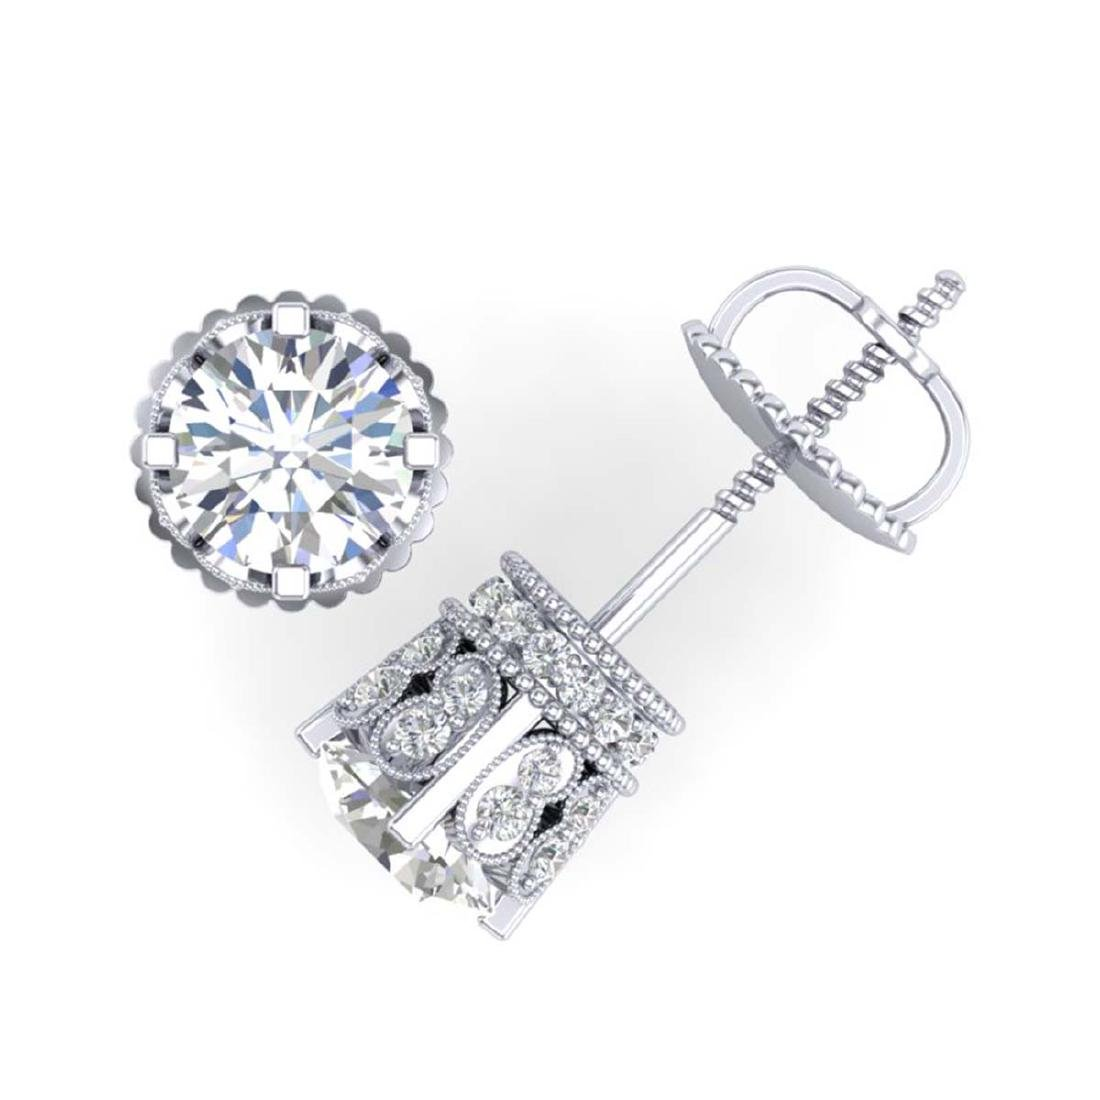 3 CTW VS/SI Diamond Solitaire Art Deco Stud Earrings - 3